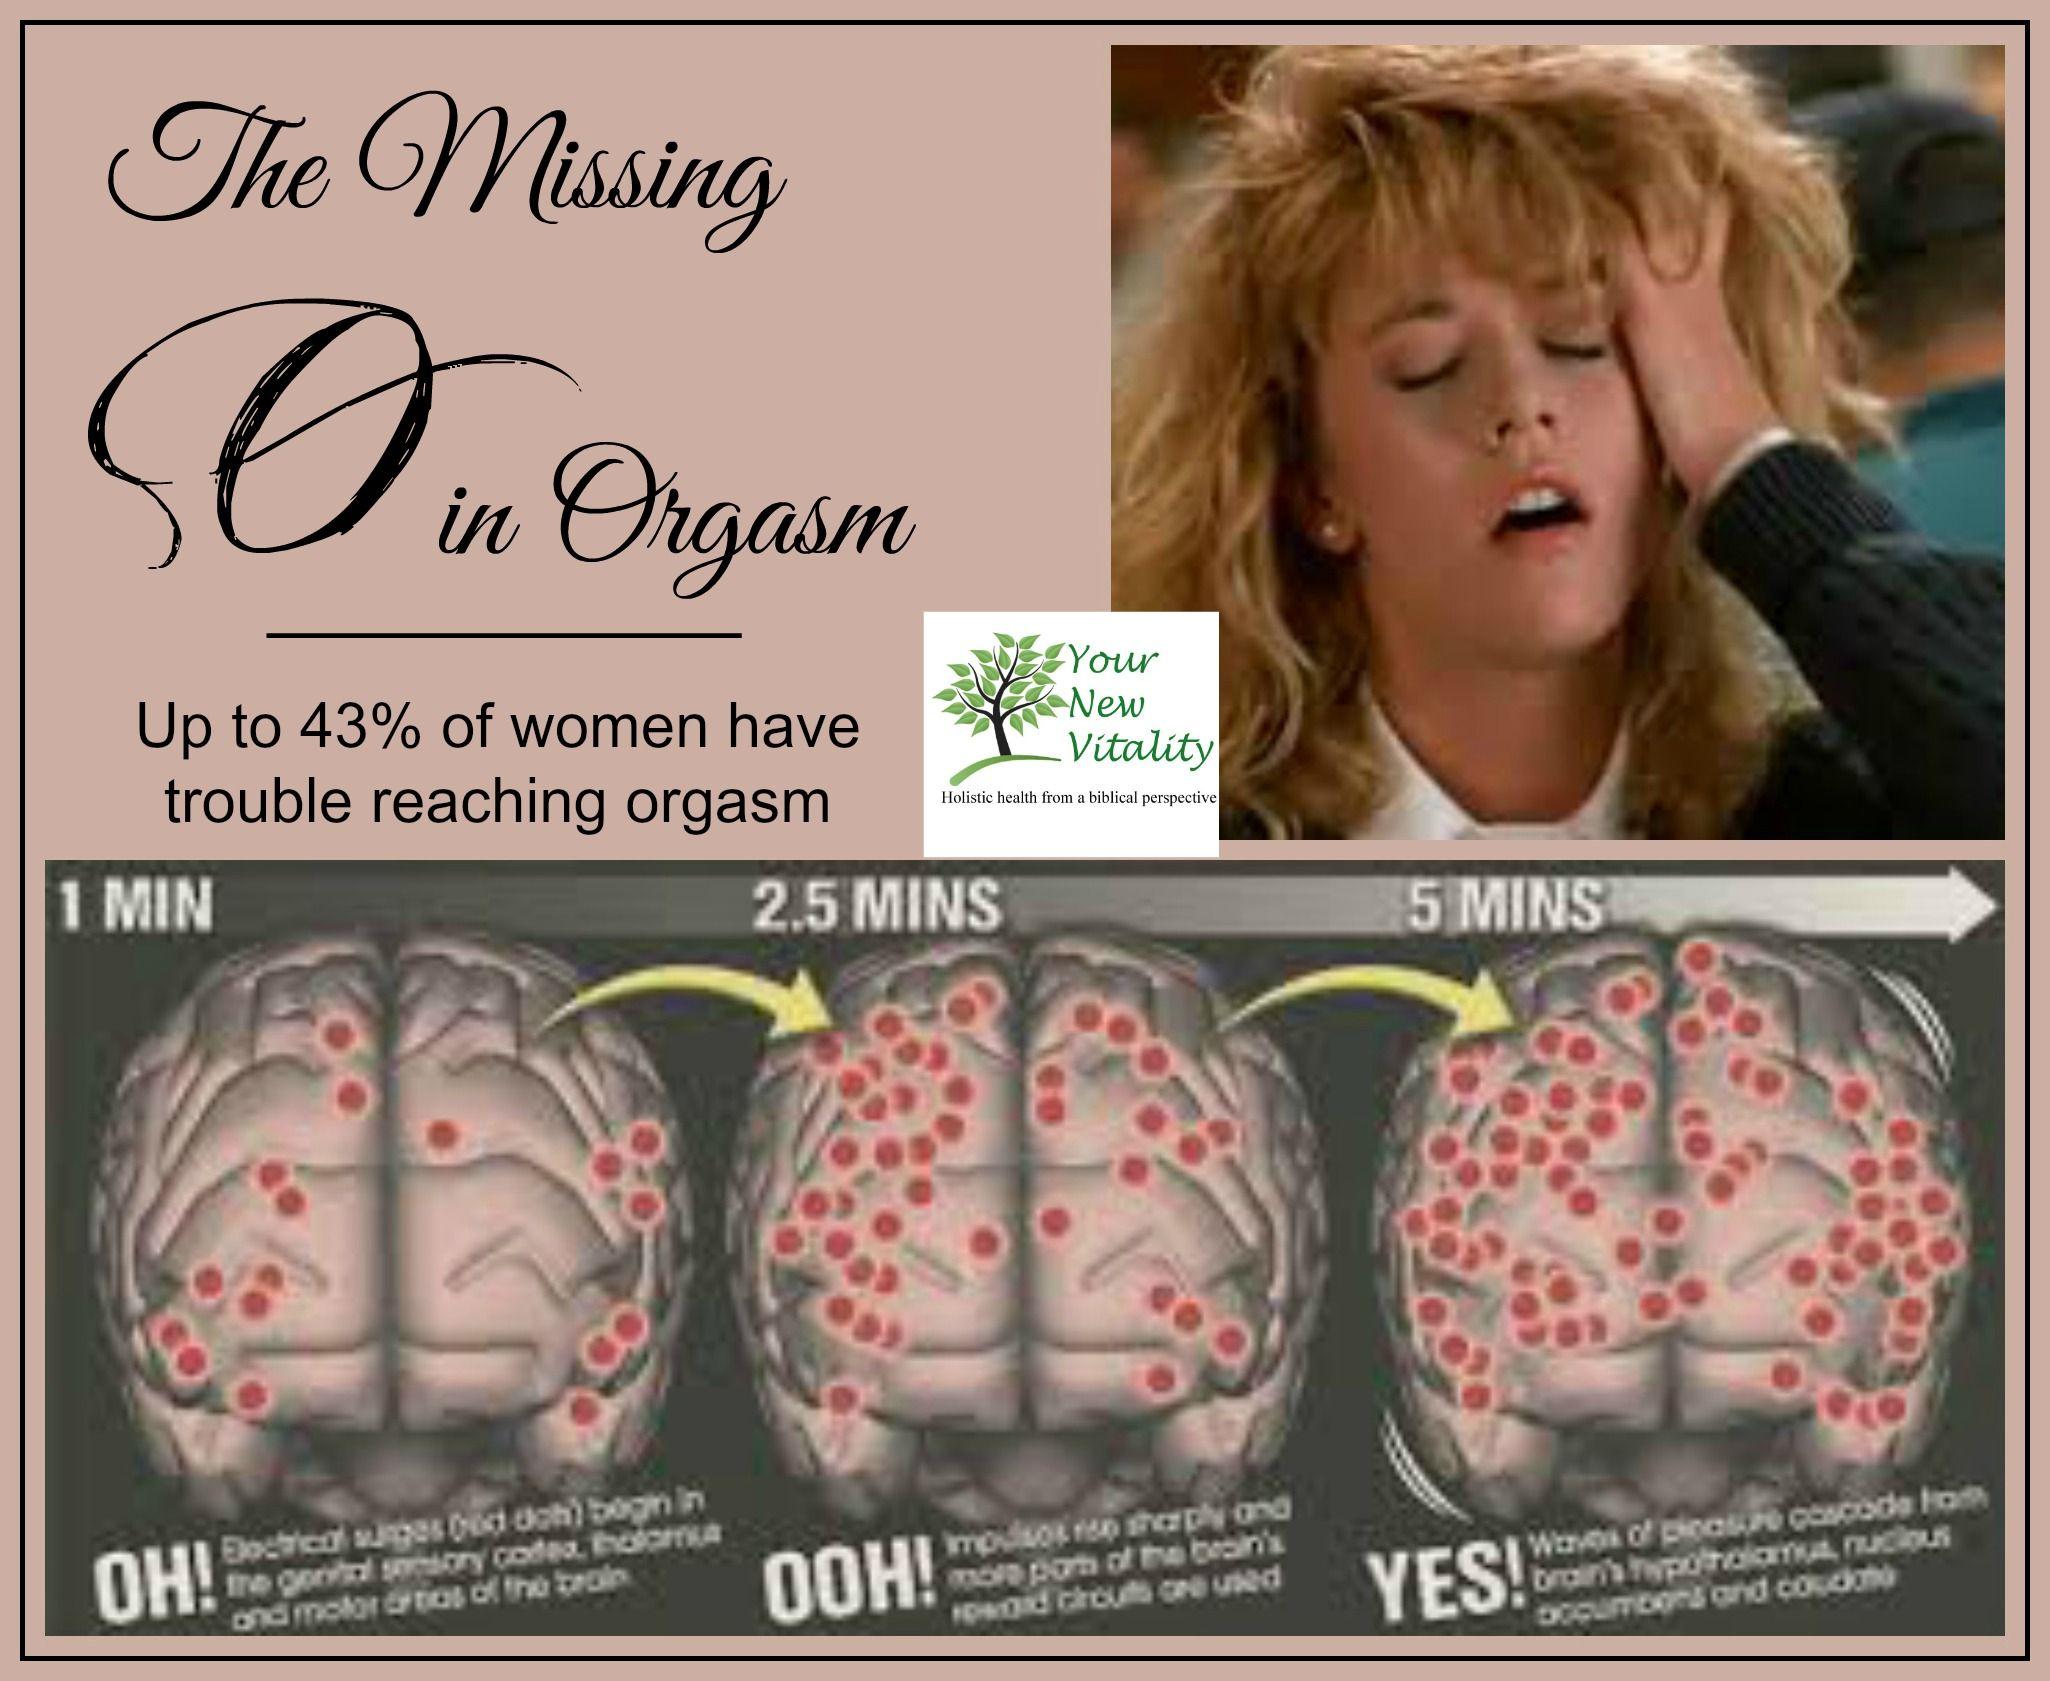 Other Alternatives To Reach Orgasm